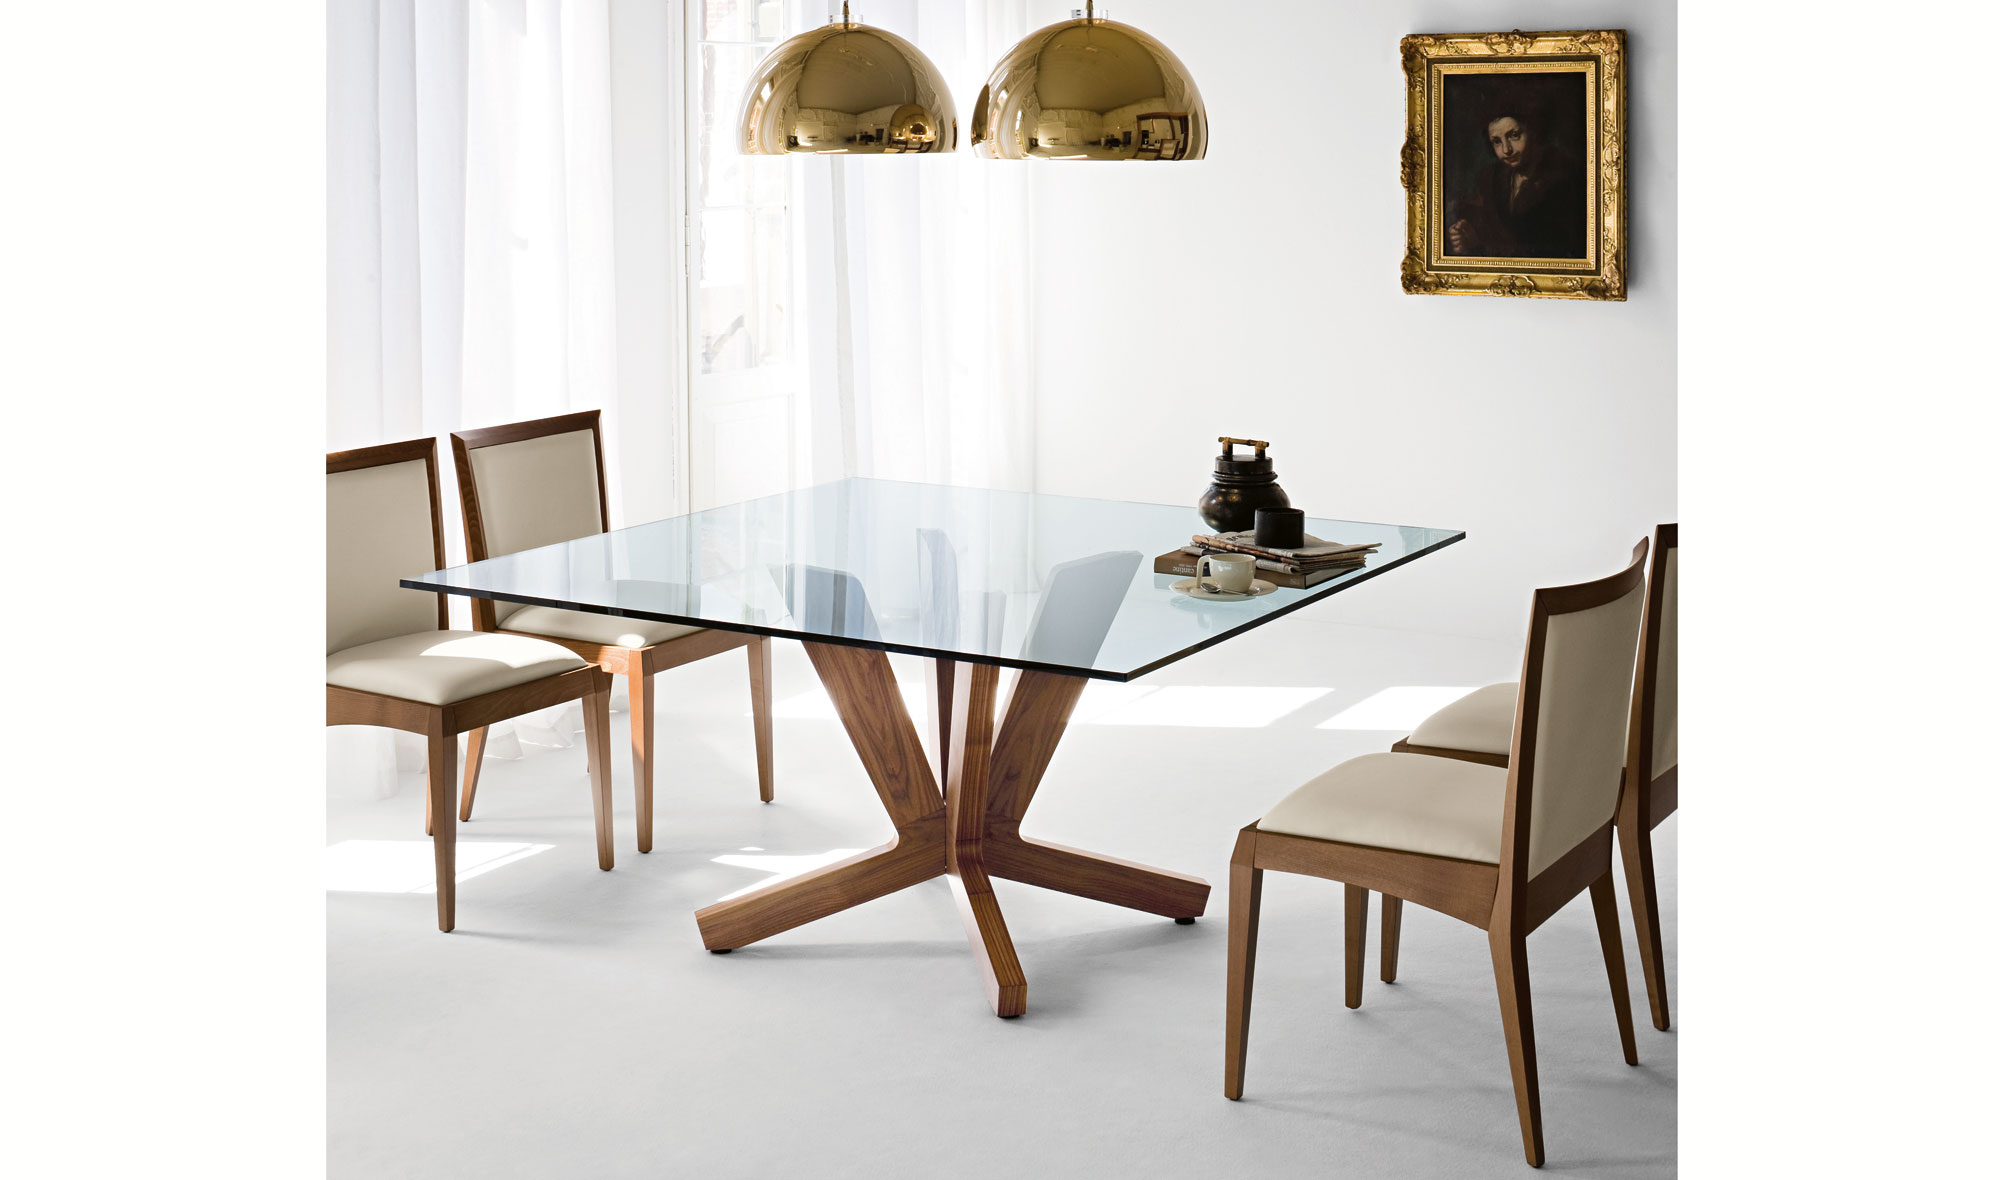 Mesa de comedor cuadrada moderna goblin en for Muebles de comedor mesas